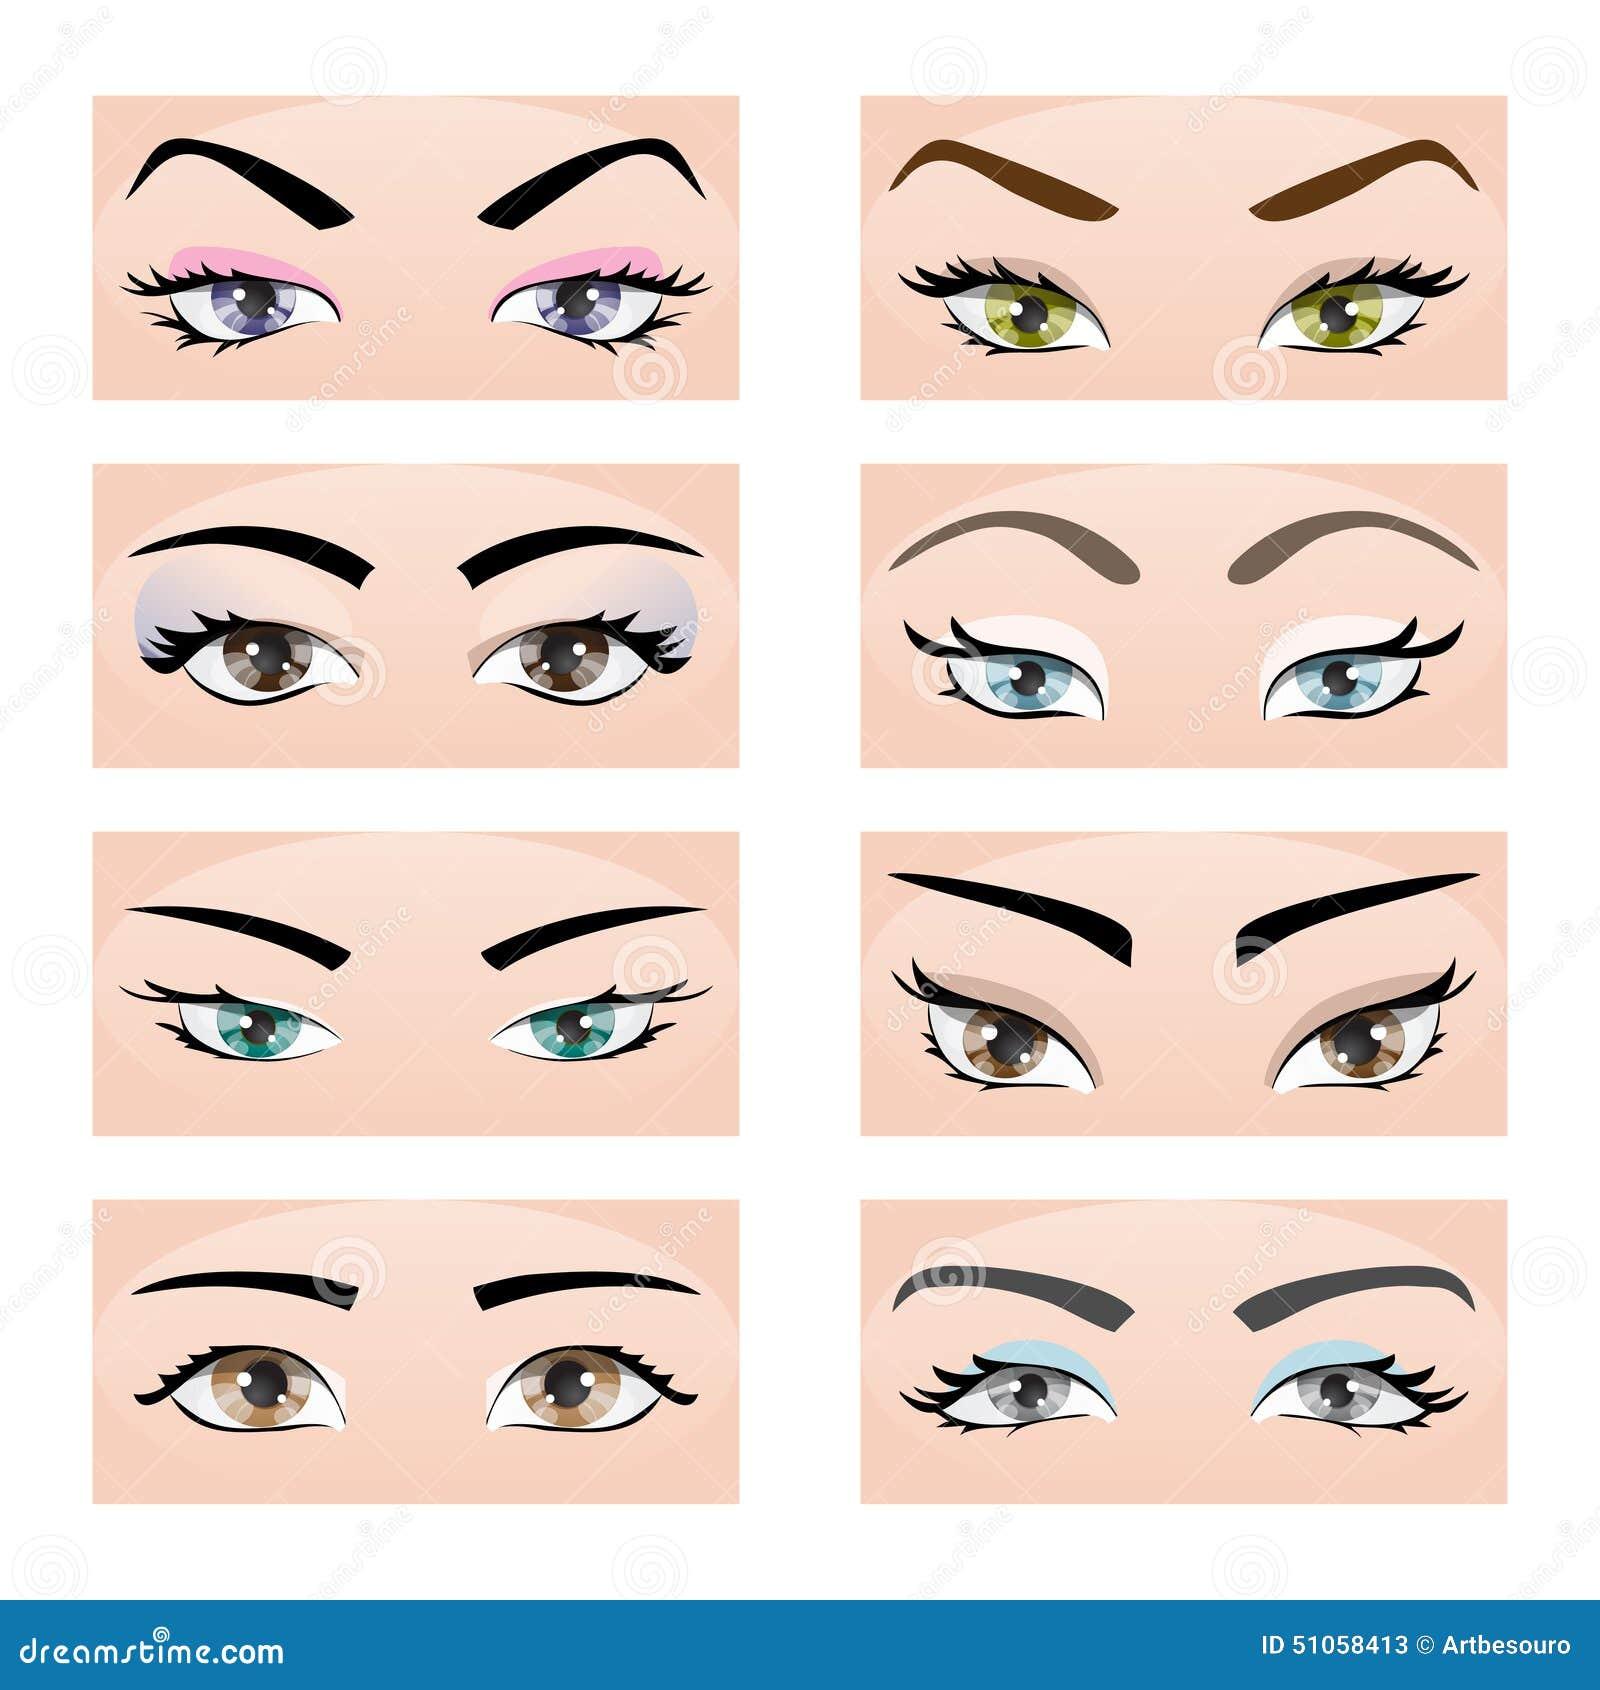 human nose types chart